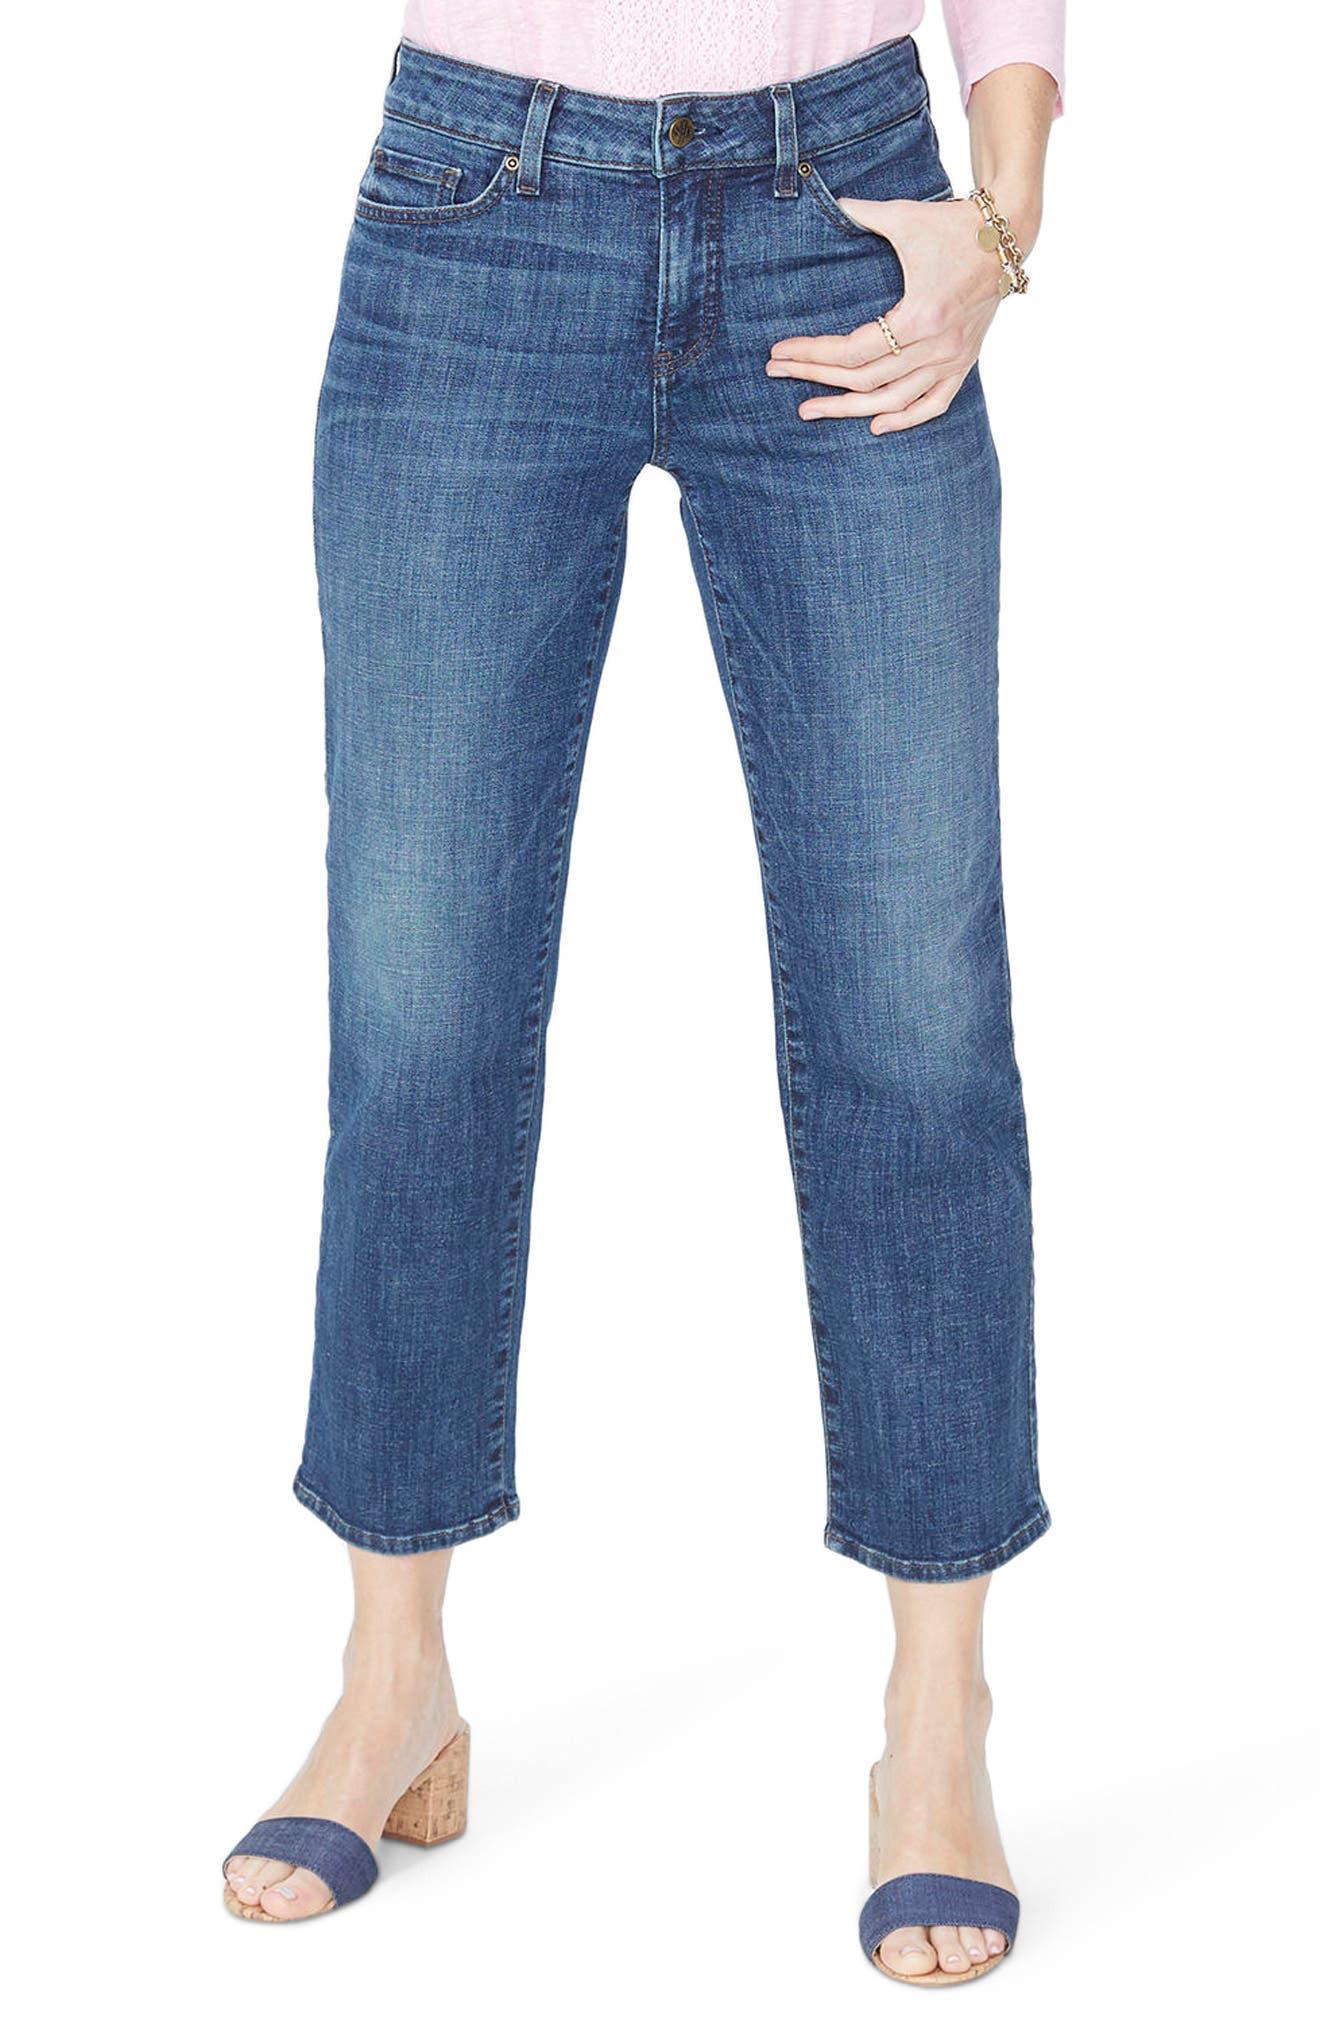 NYDJ Jenna Straight Leg Ankle Jeans (Desert Gold)